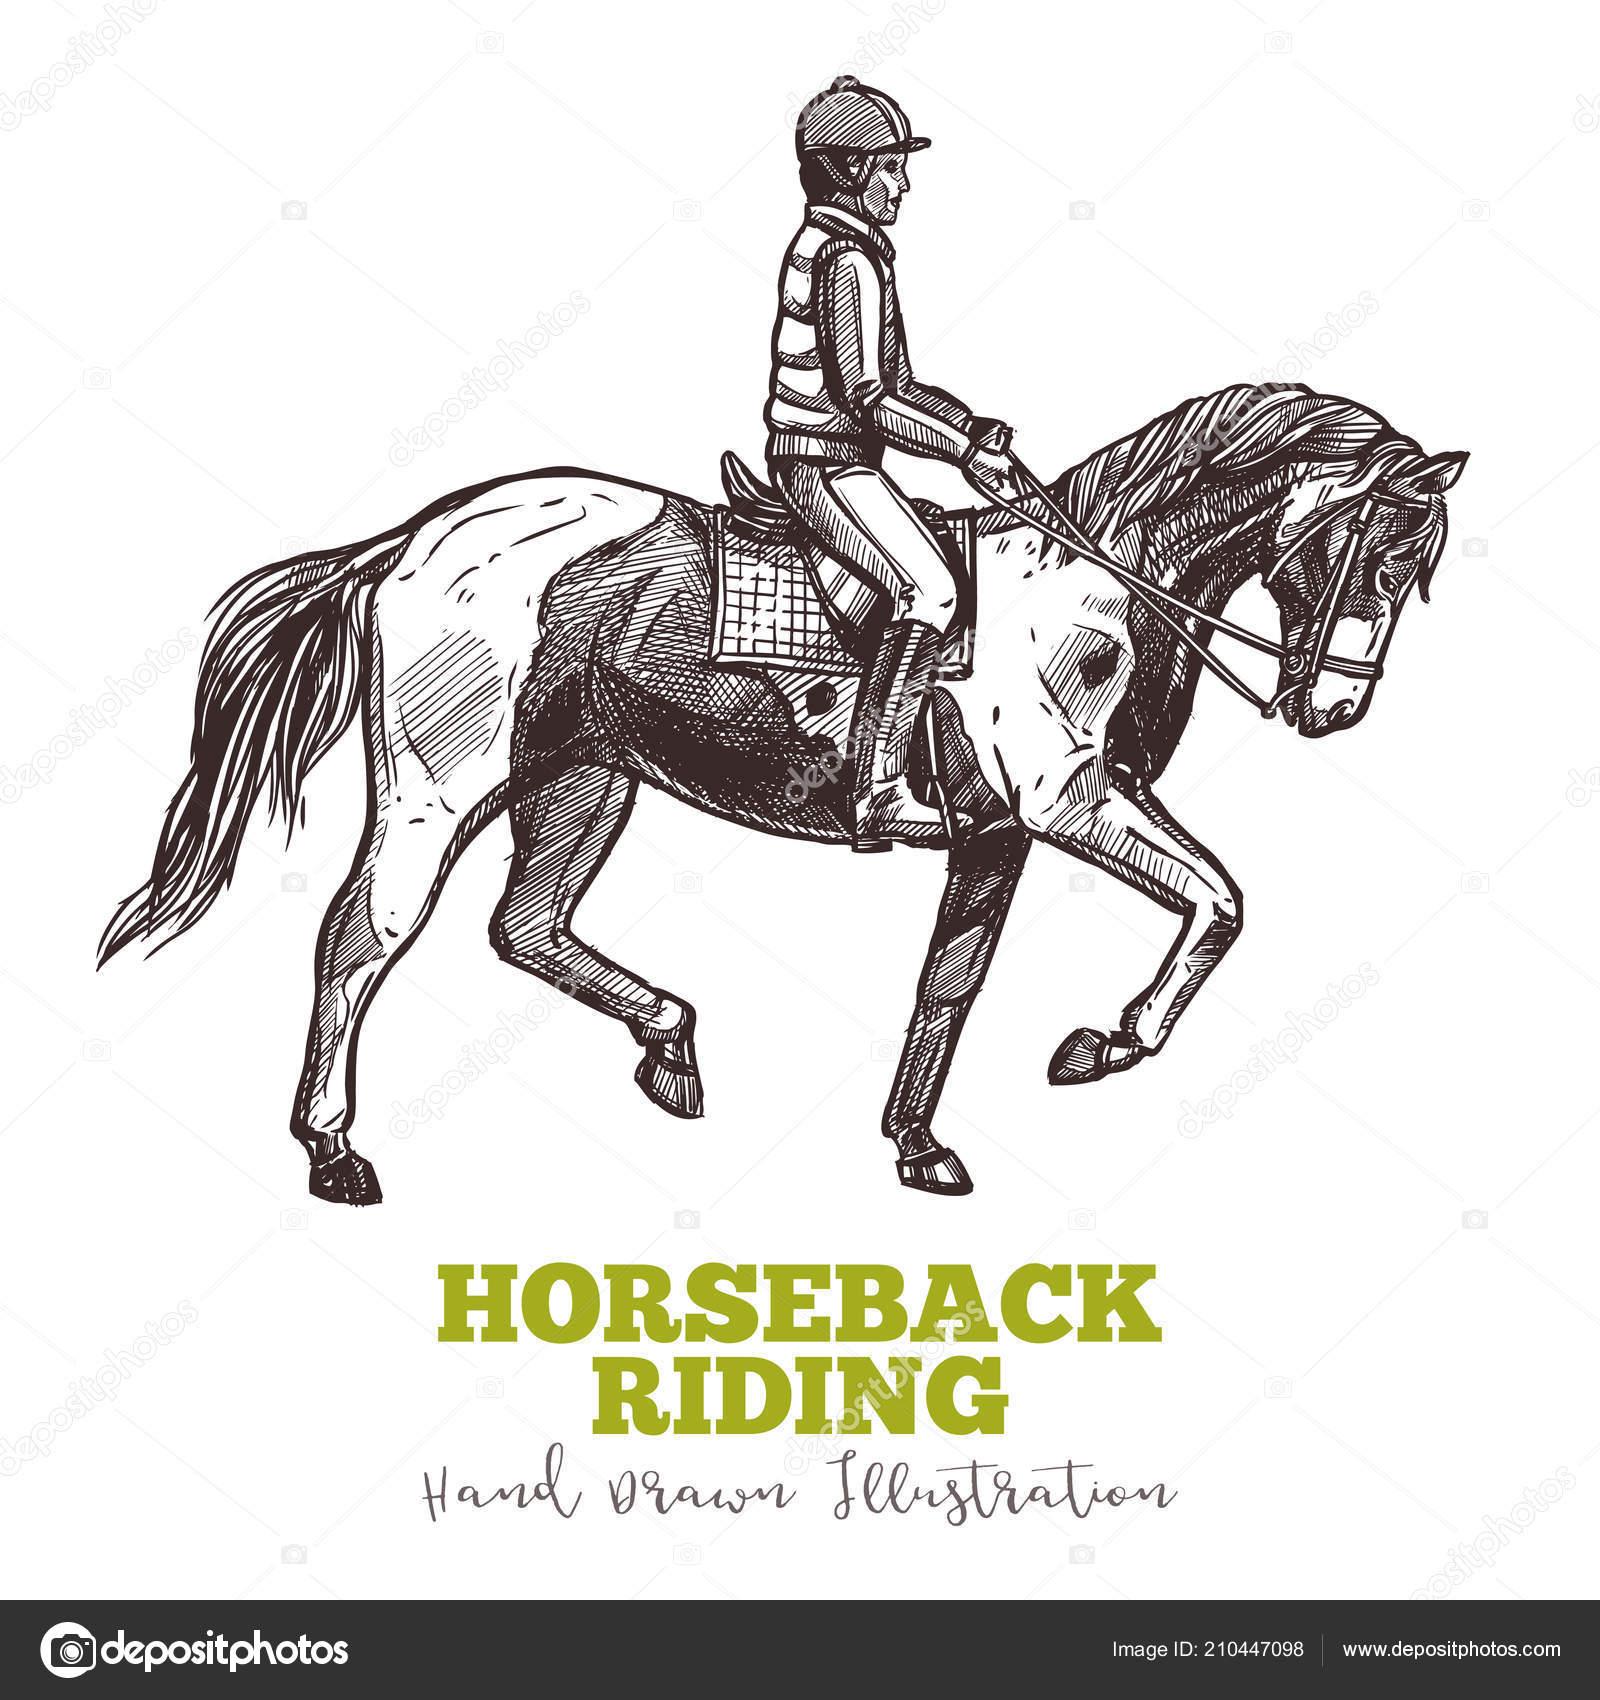 Design Horse Riding Poster Hand Drawn Horse Sketch Illustration Riding Stock Vector C Alexrockheart 210447098